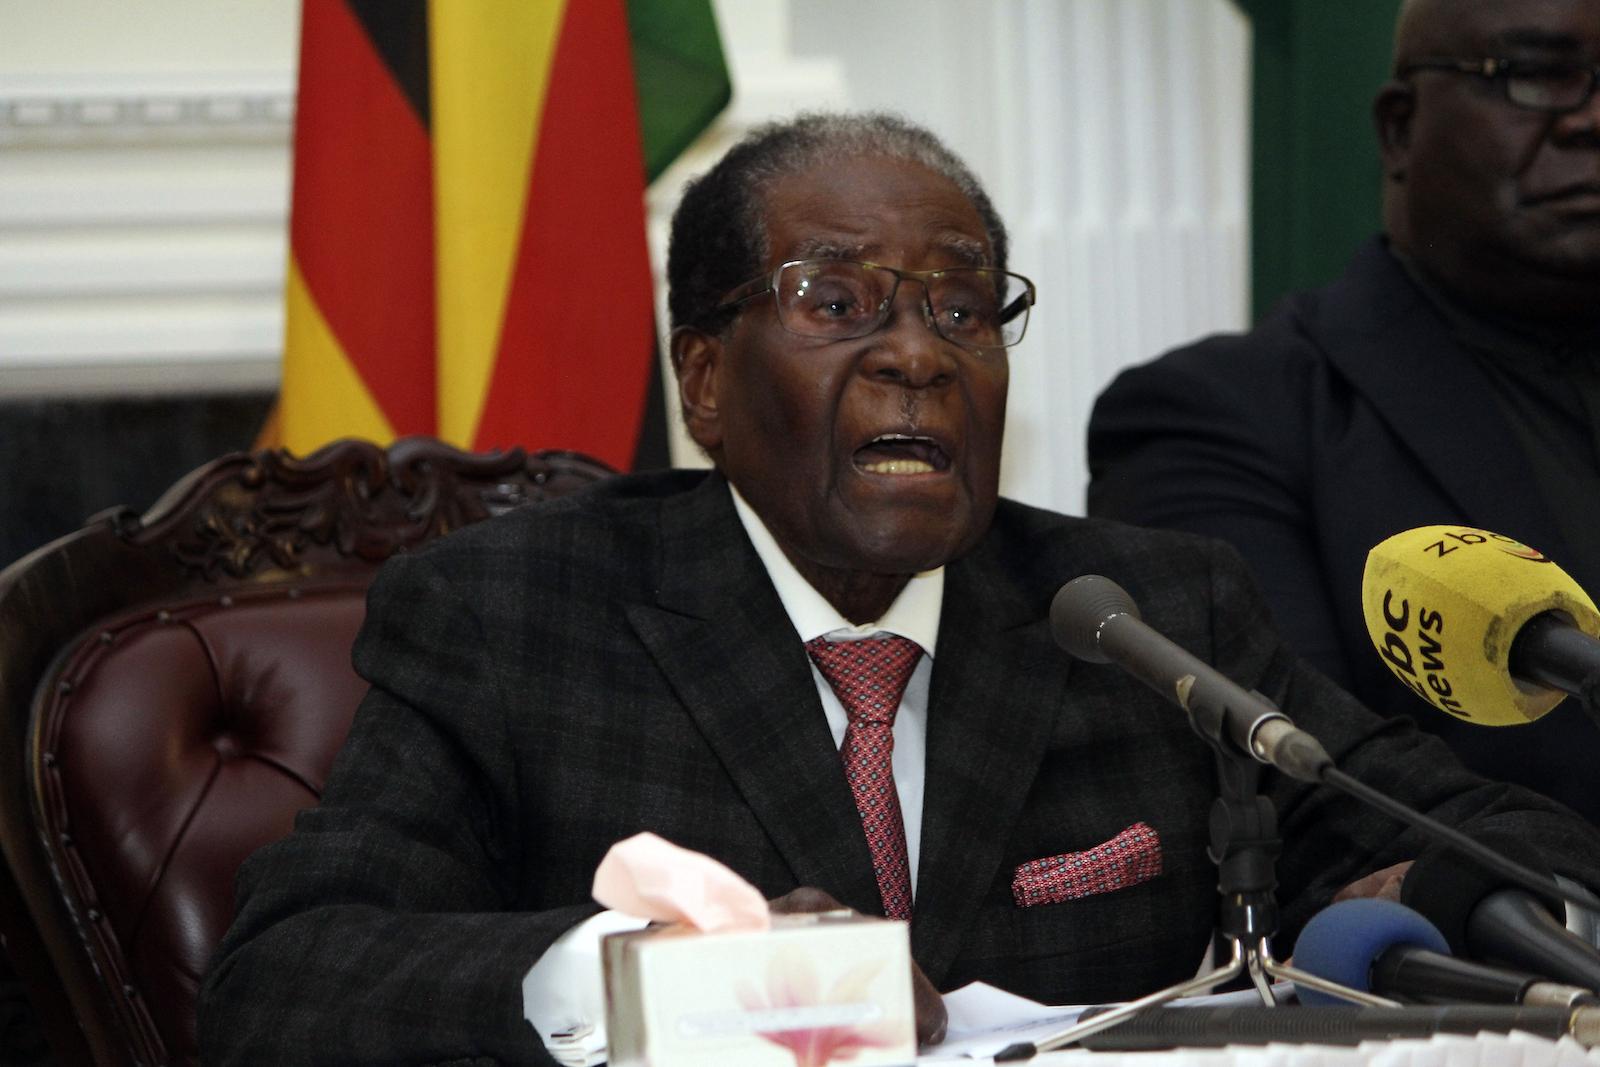 Zimbabwe Mugabe not resignation speech